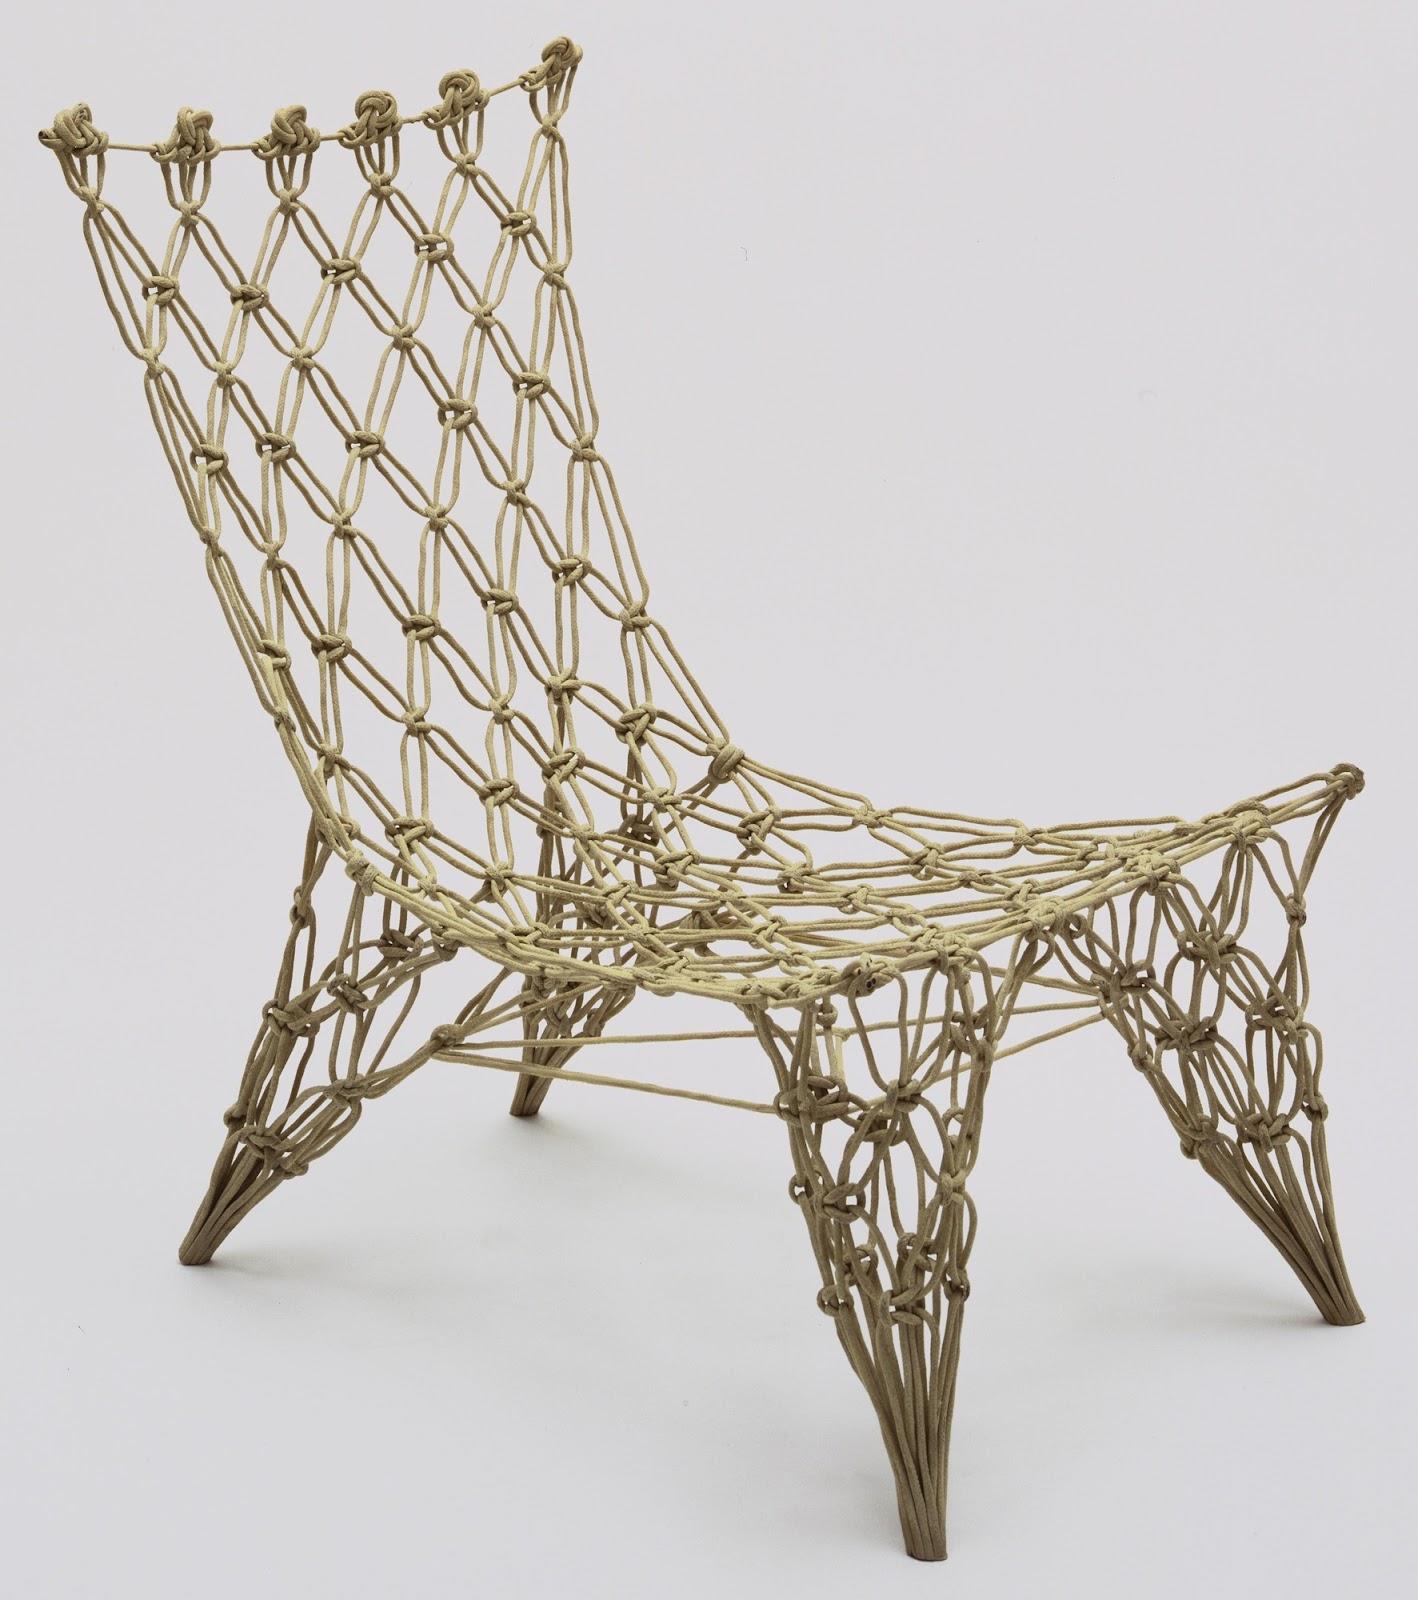 Knotted Chair hasil karya internasional Marcel Wanders - source: moma.org